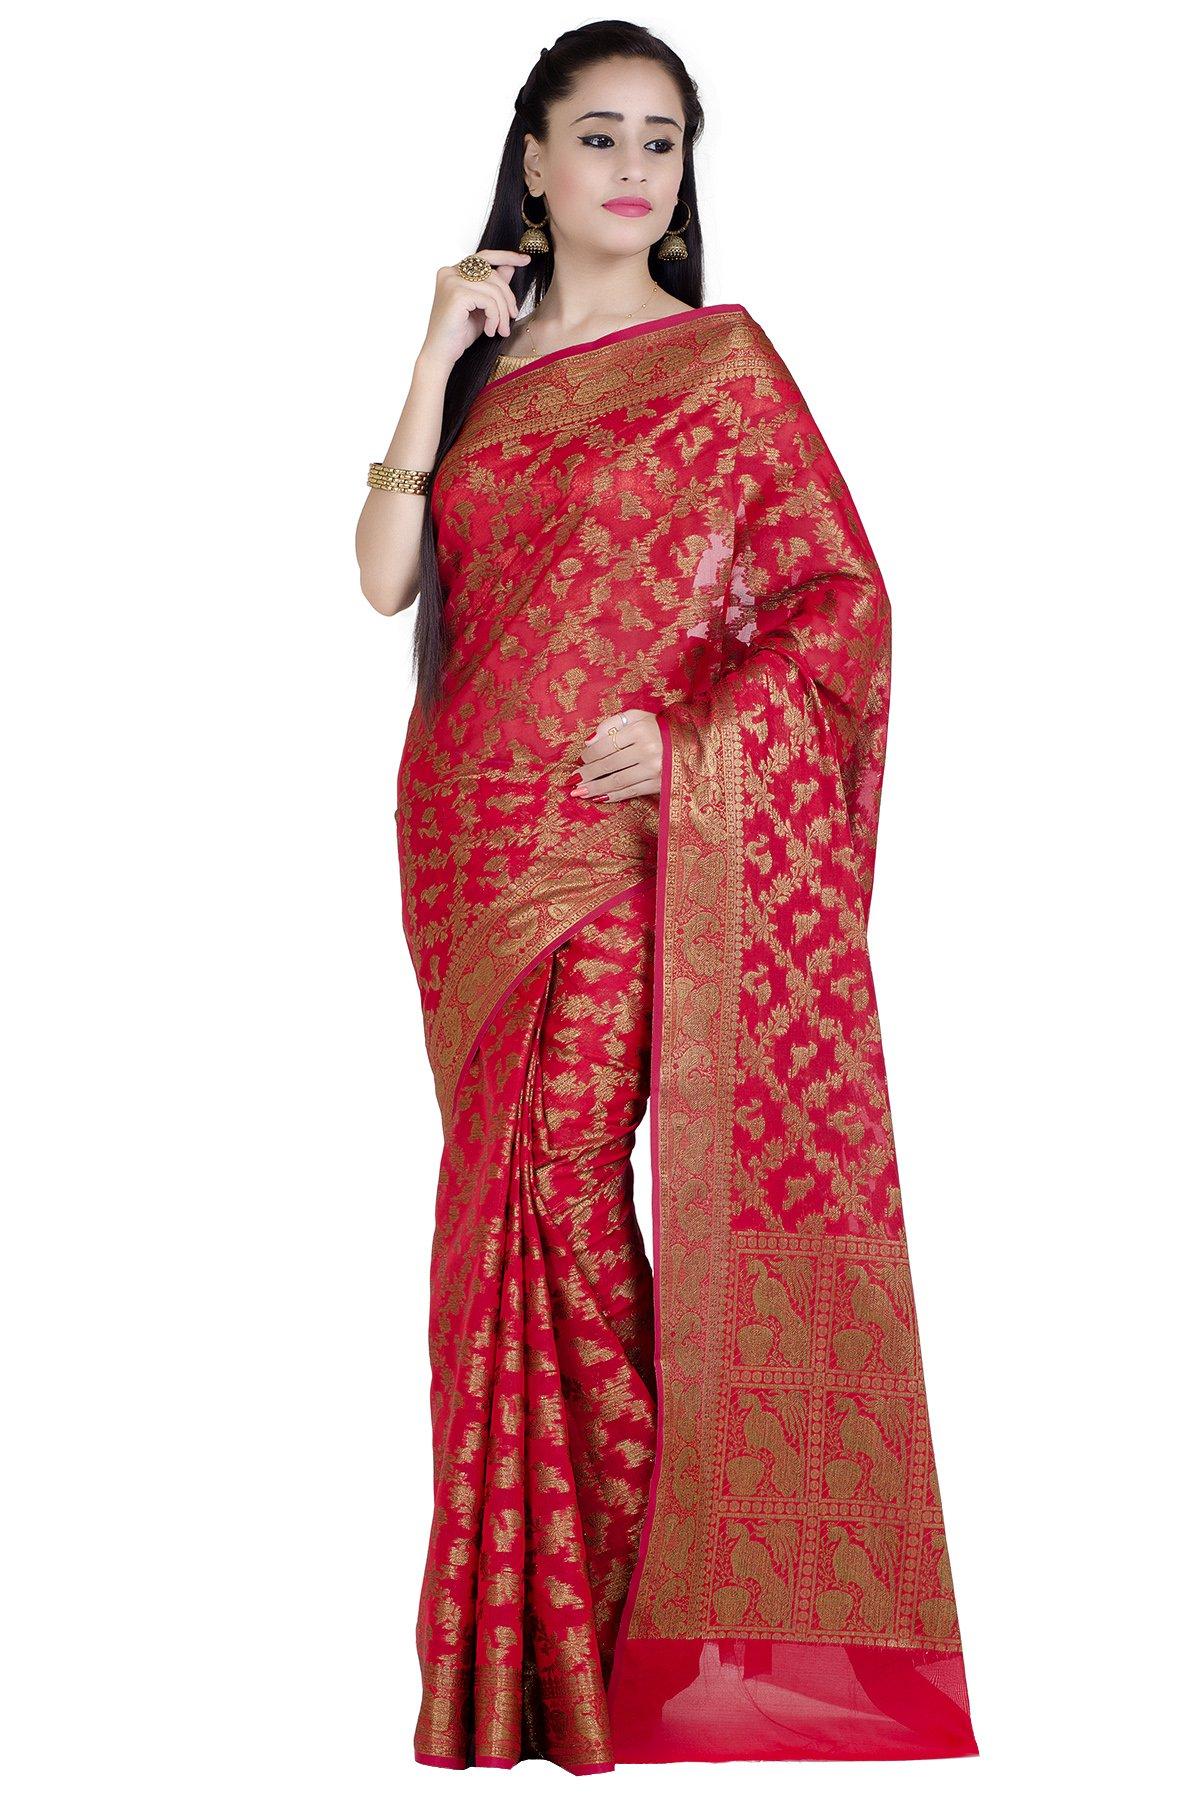 Chandrakala Women's Red Cotton Silk Banarasi Saree(1289RED)